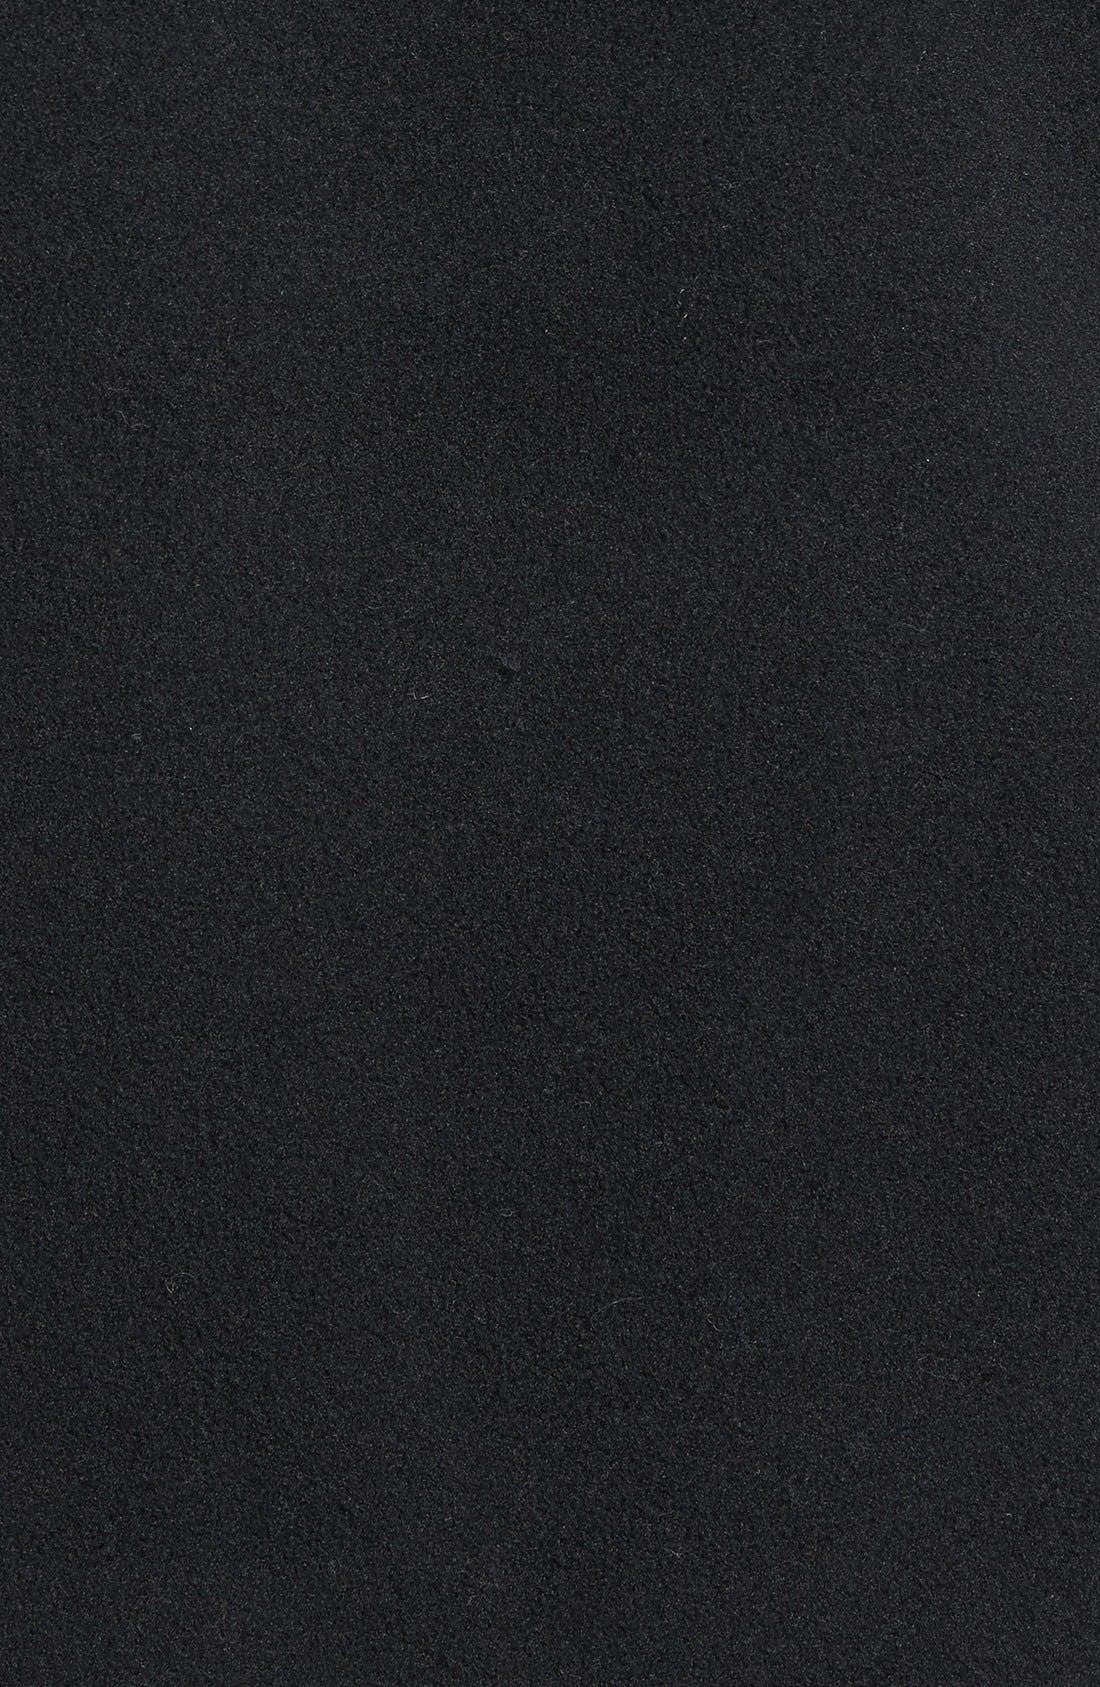 Denali 2 Recycled Fleece Jacket,                             Alternate thumbnail 6, color,                             001